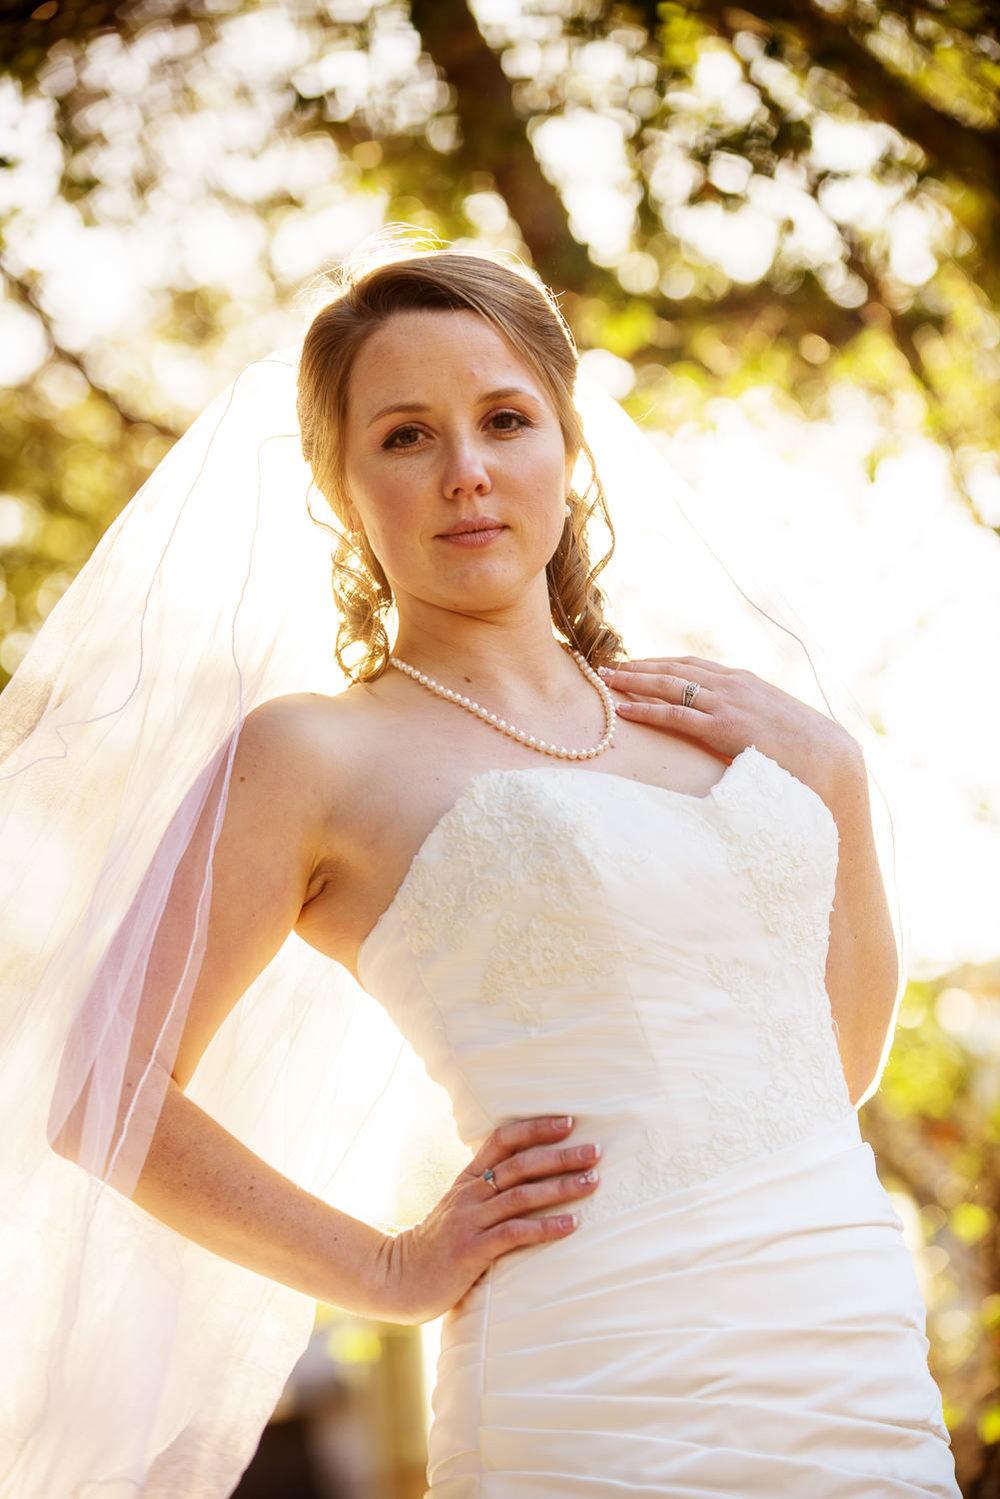 f27-Photography-Ojai-Wedding-February-2014-Beautiful-Bride-Portrait